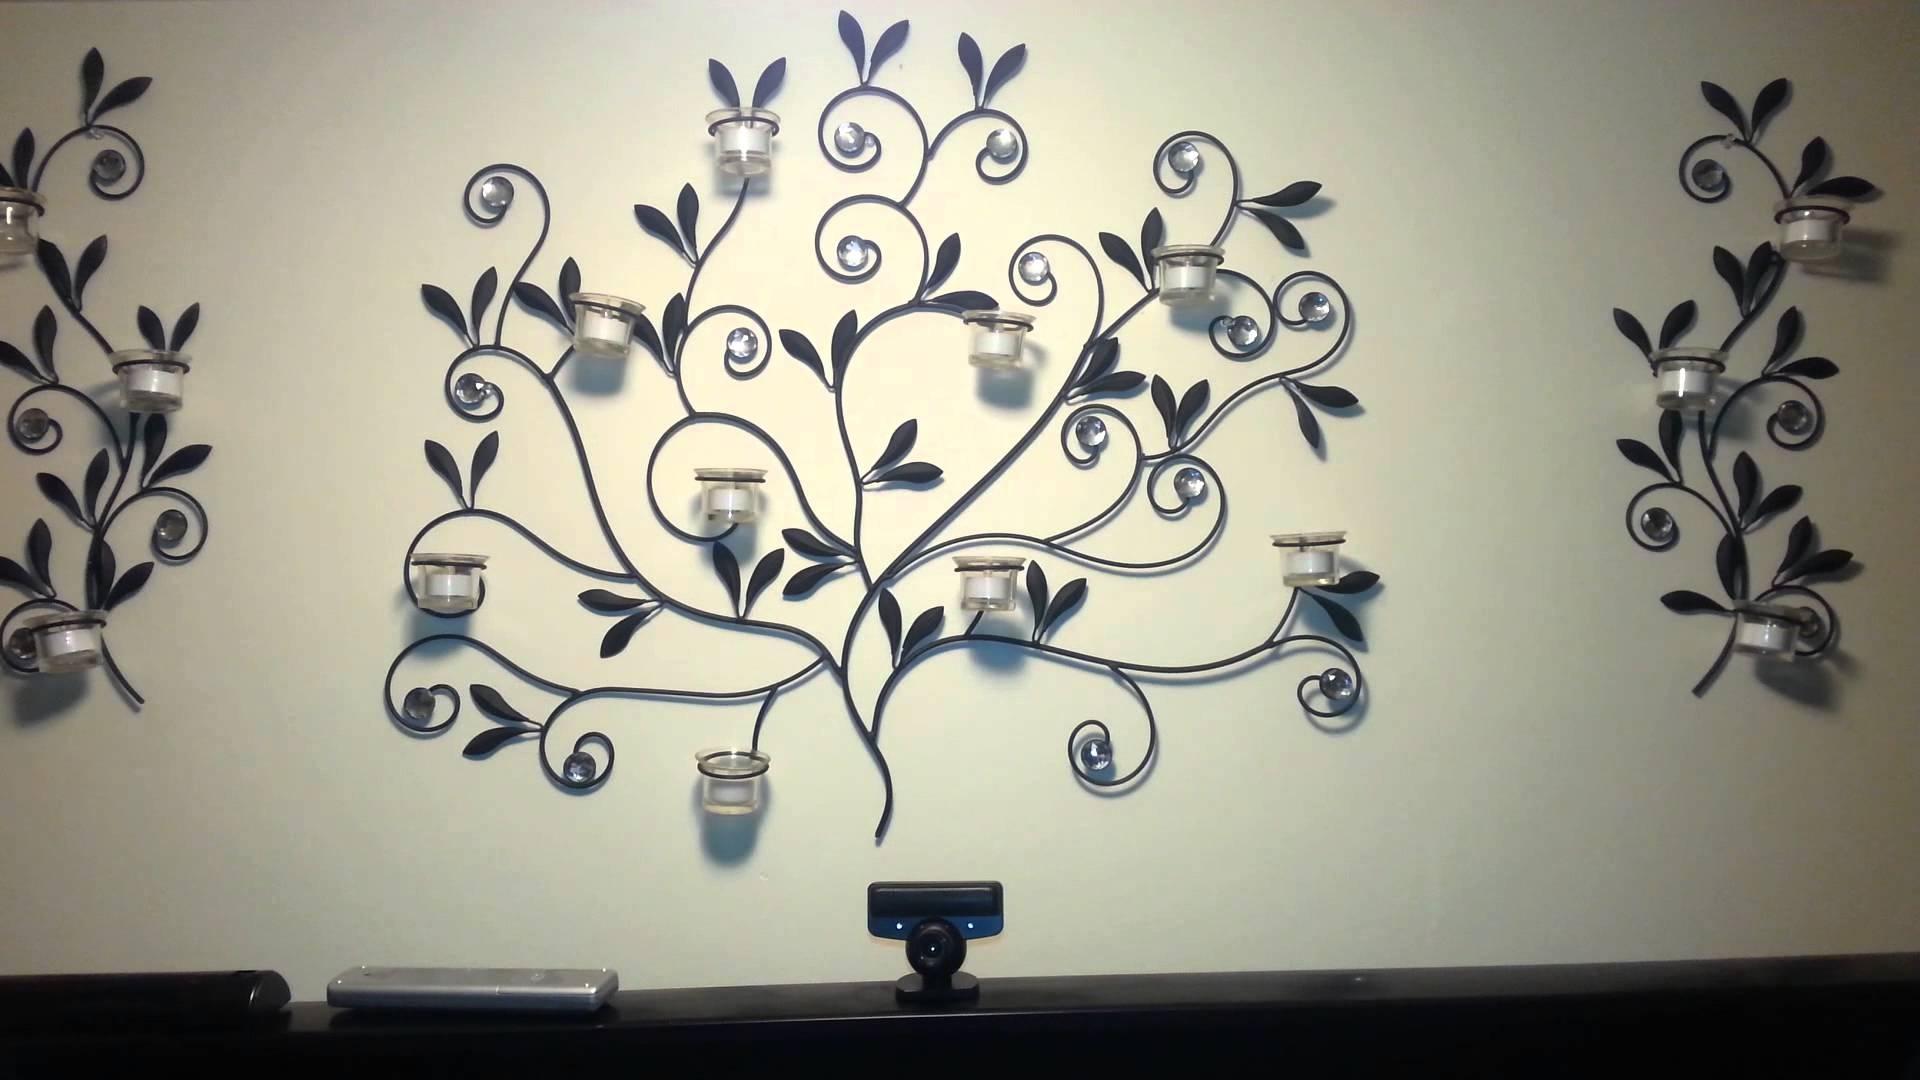 Walmart Metal Wall Art – Youtube Pertaining To Recent Walmart Wall Art (Gallery 1 of 20)